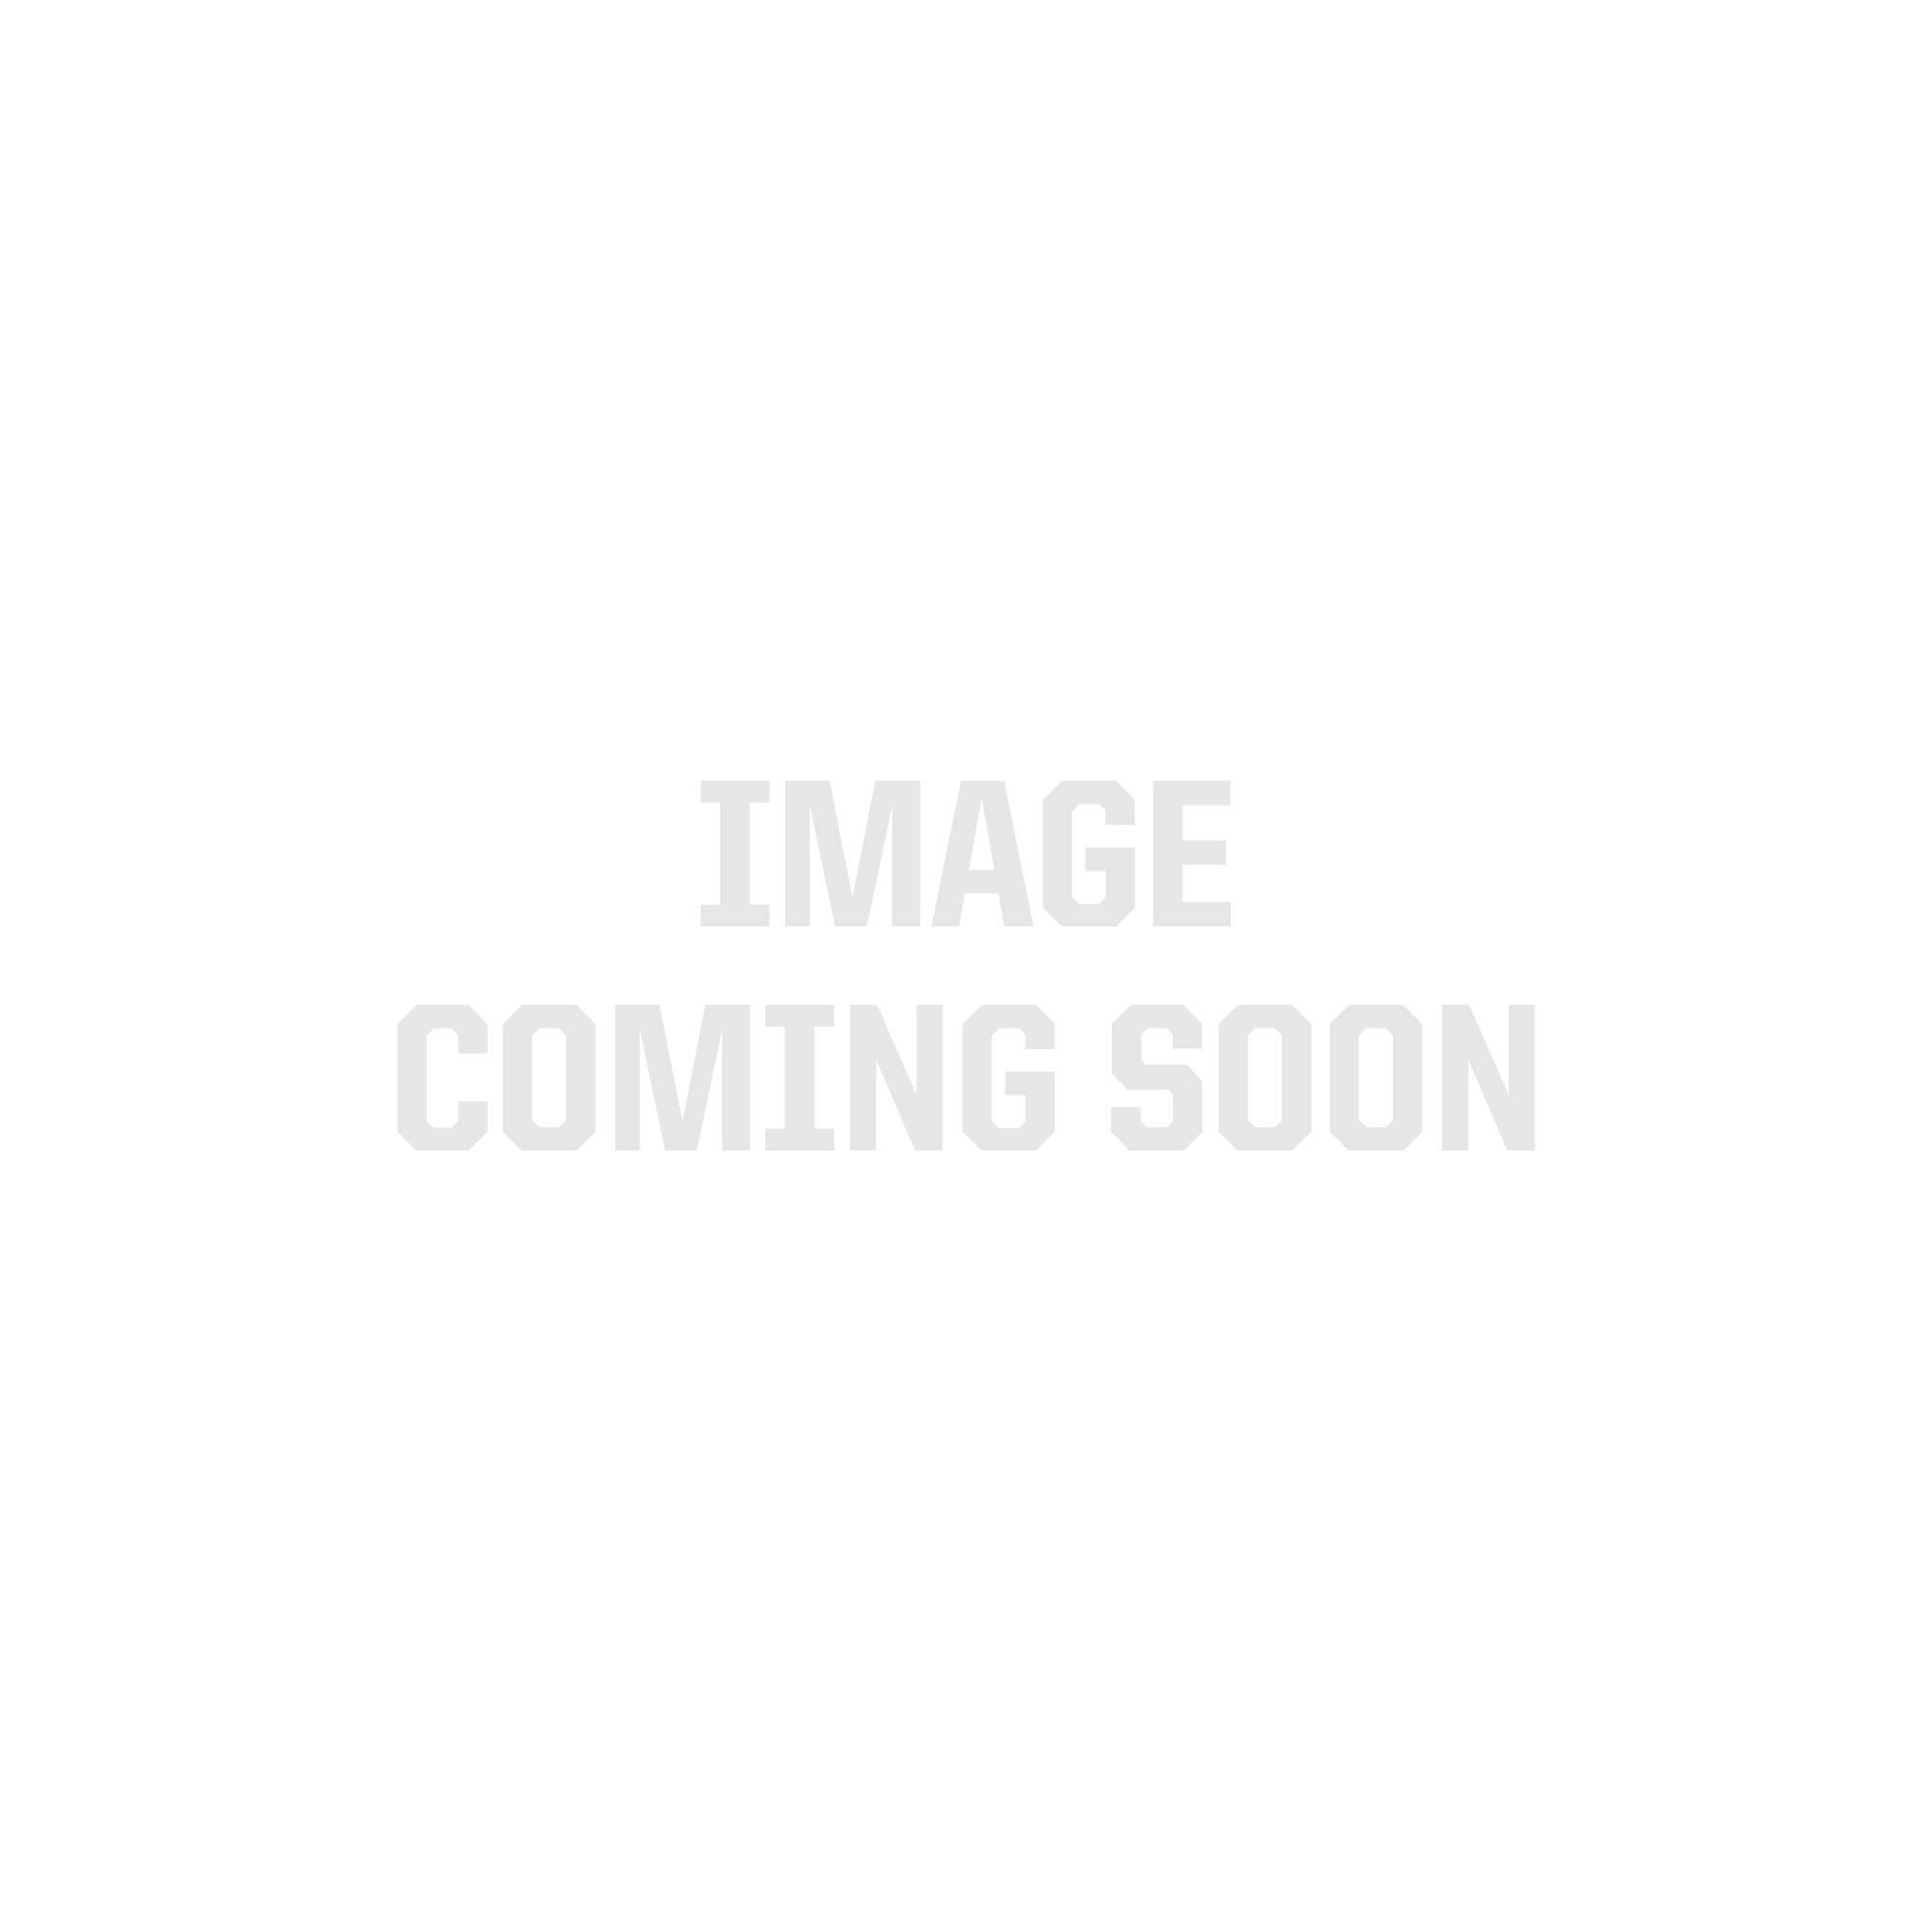 5.11 Tactical Alta Belt Bonded Nylon Heavy Duty Strap Military Style 59538 S-4XL